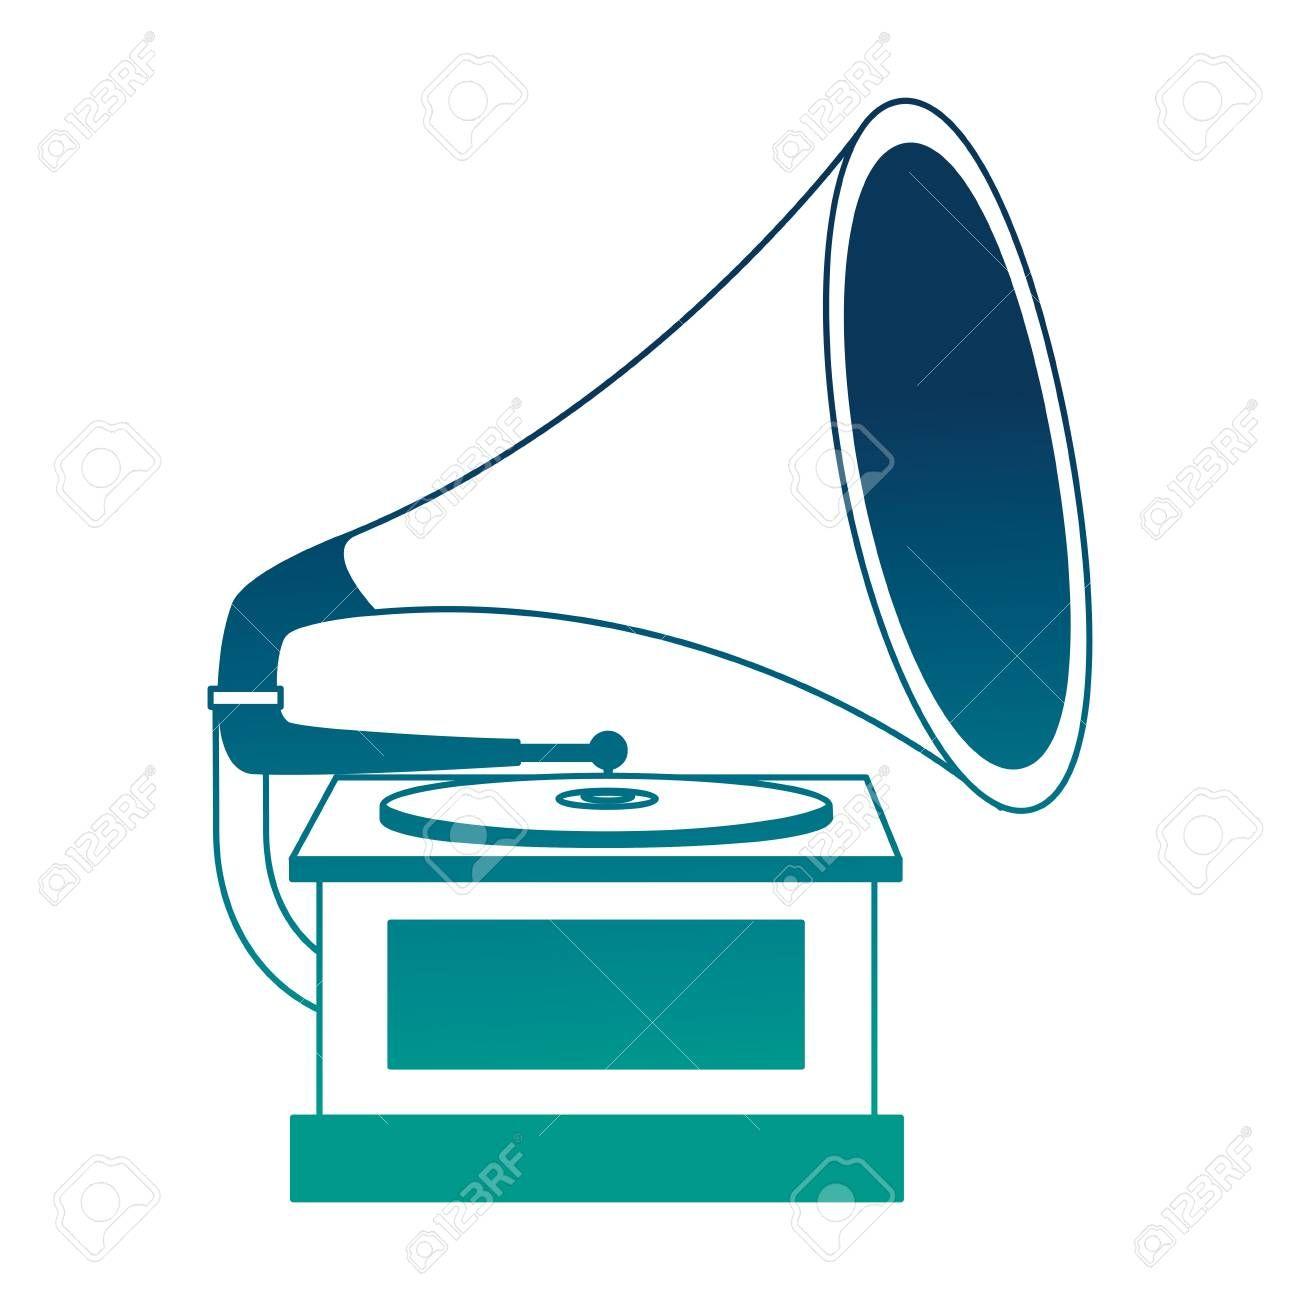 gramophone music retro icon vector illustration design sponsored retro music gramophone icon design style inspiration inspiration illustration pinterest